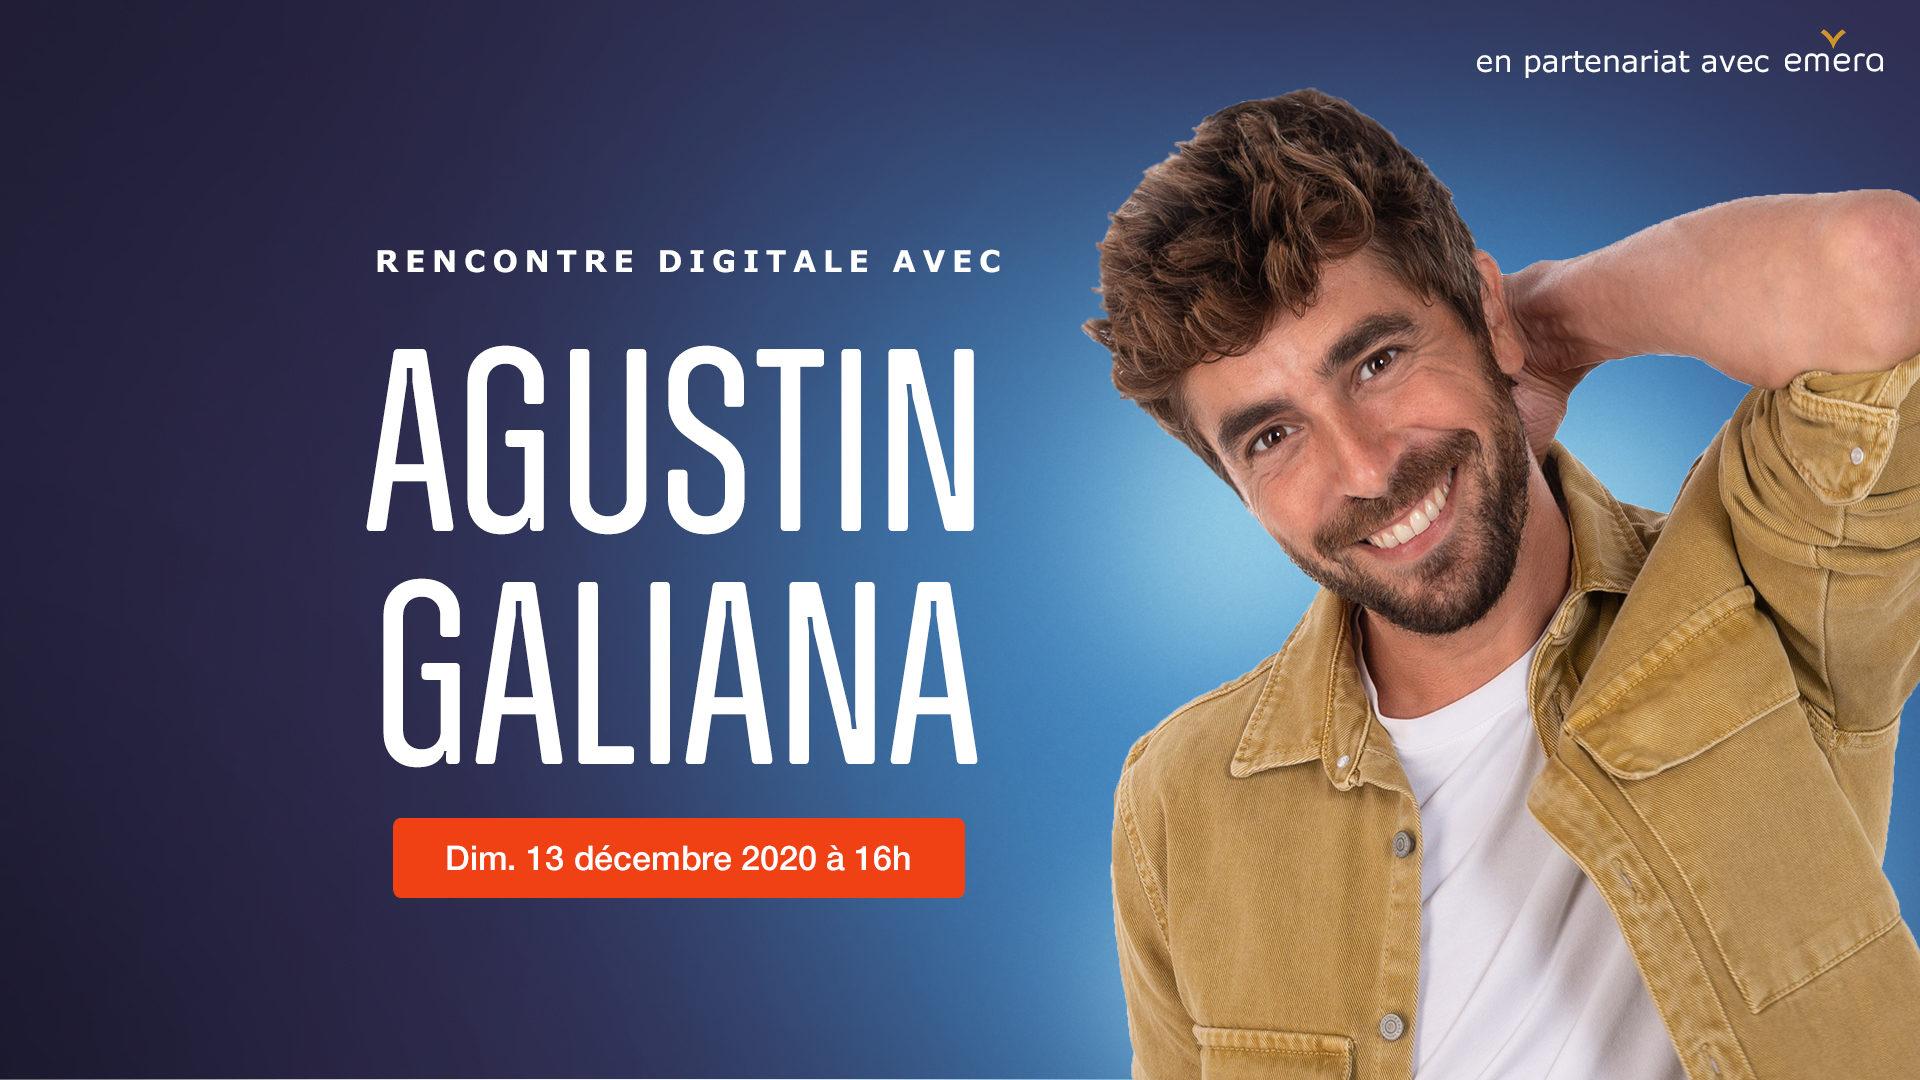 Rencontre Digitale Agustin Galiana x Emera